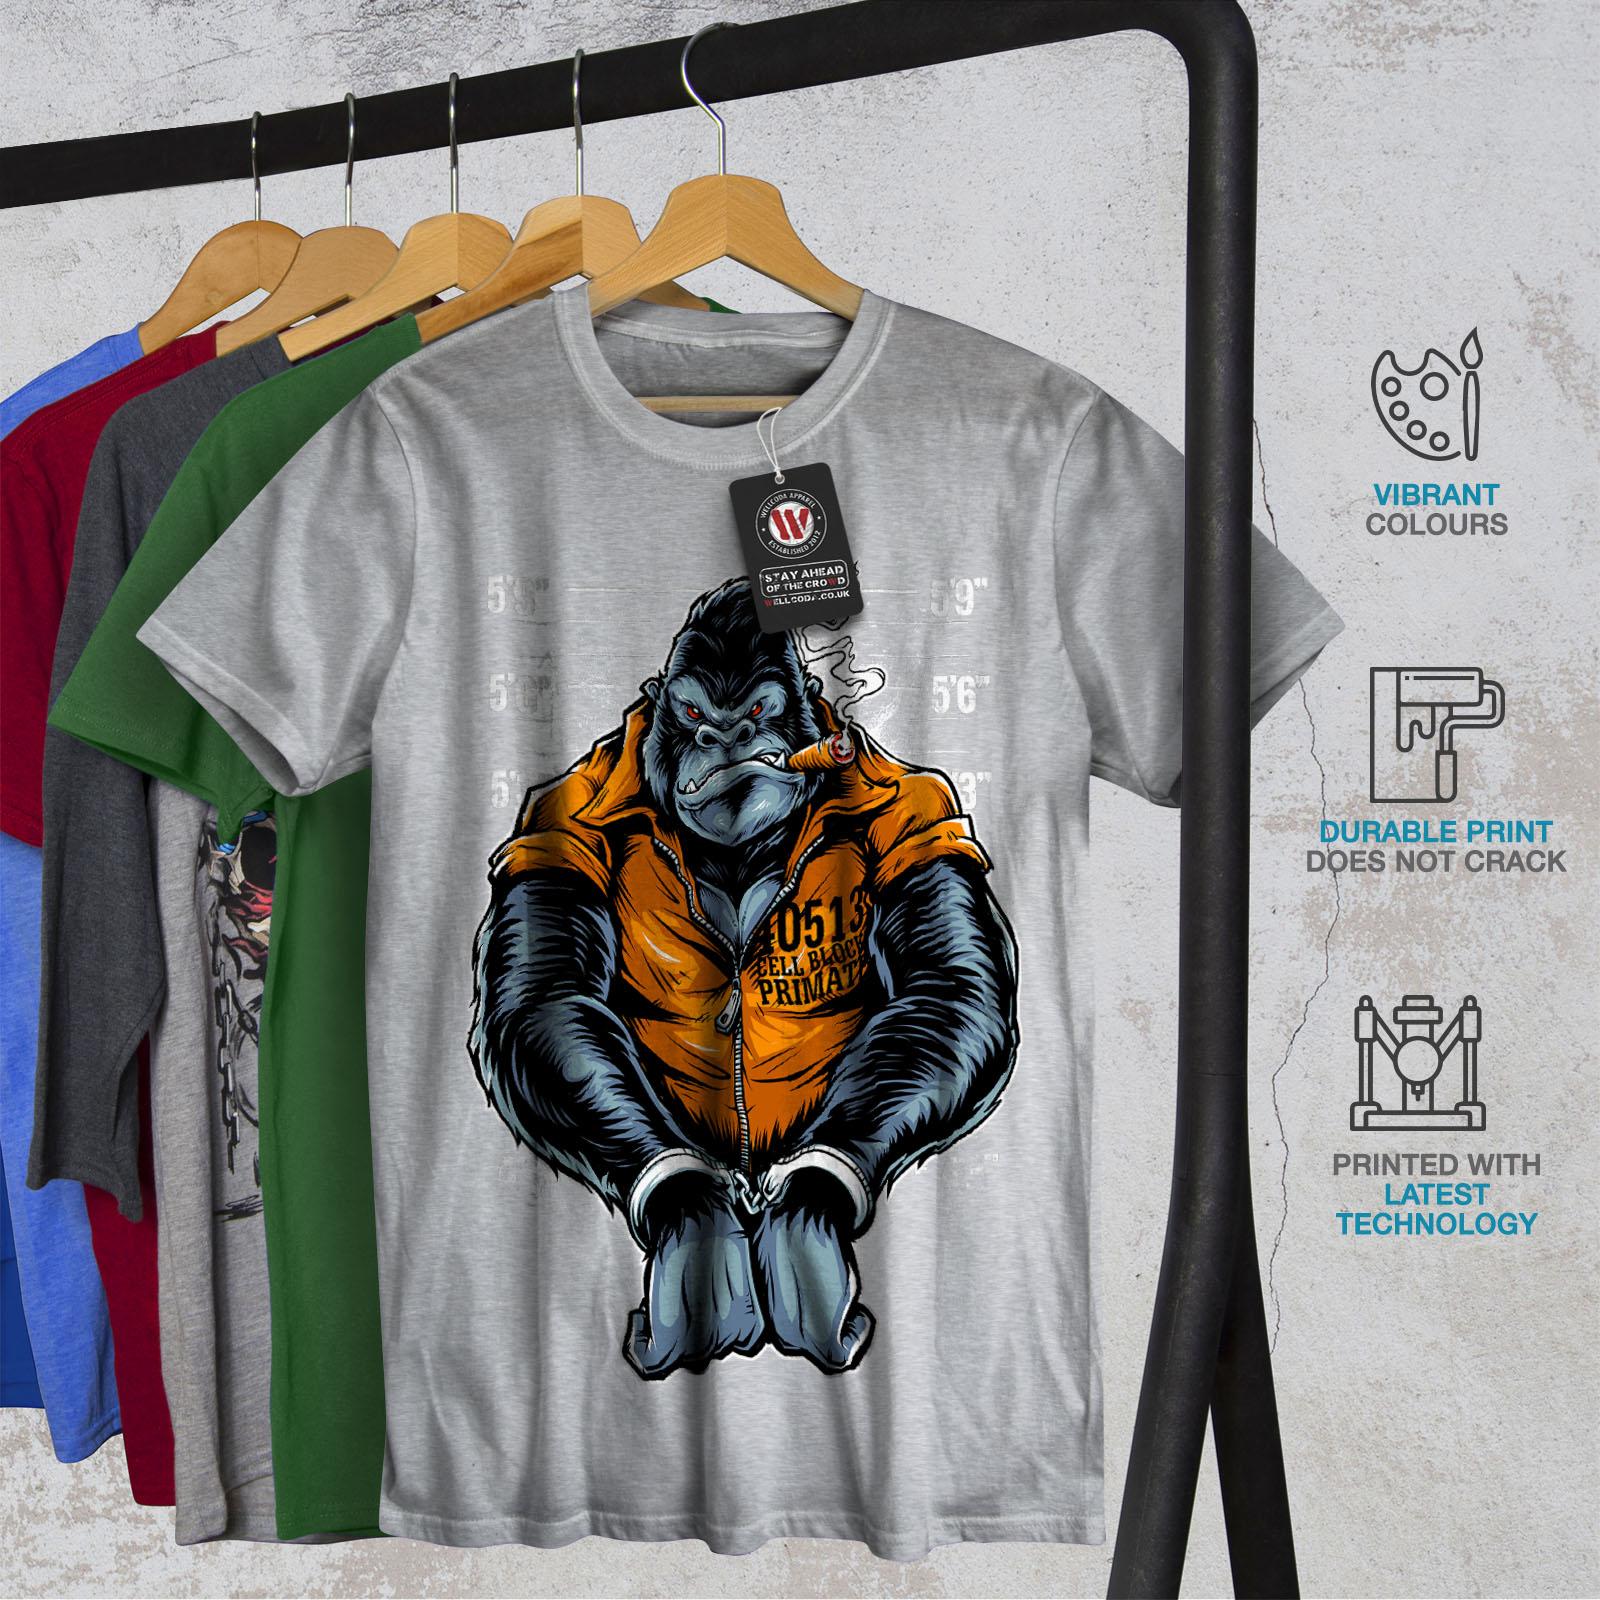 Wellcoda-Monkey-Ape-Prison-Mens-T-shirt-Wild-Graphic-Design-Printed-Tee thumbnail 18